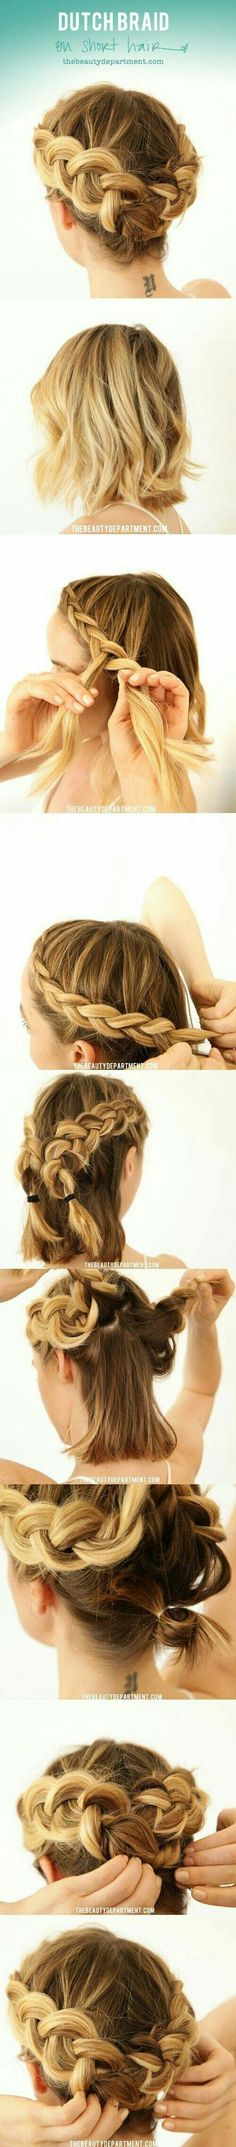 Dutch braid on short hair